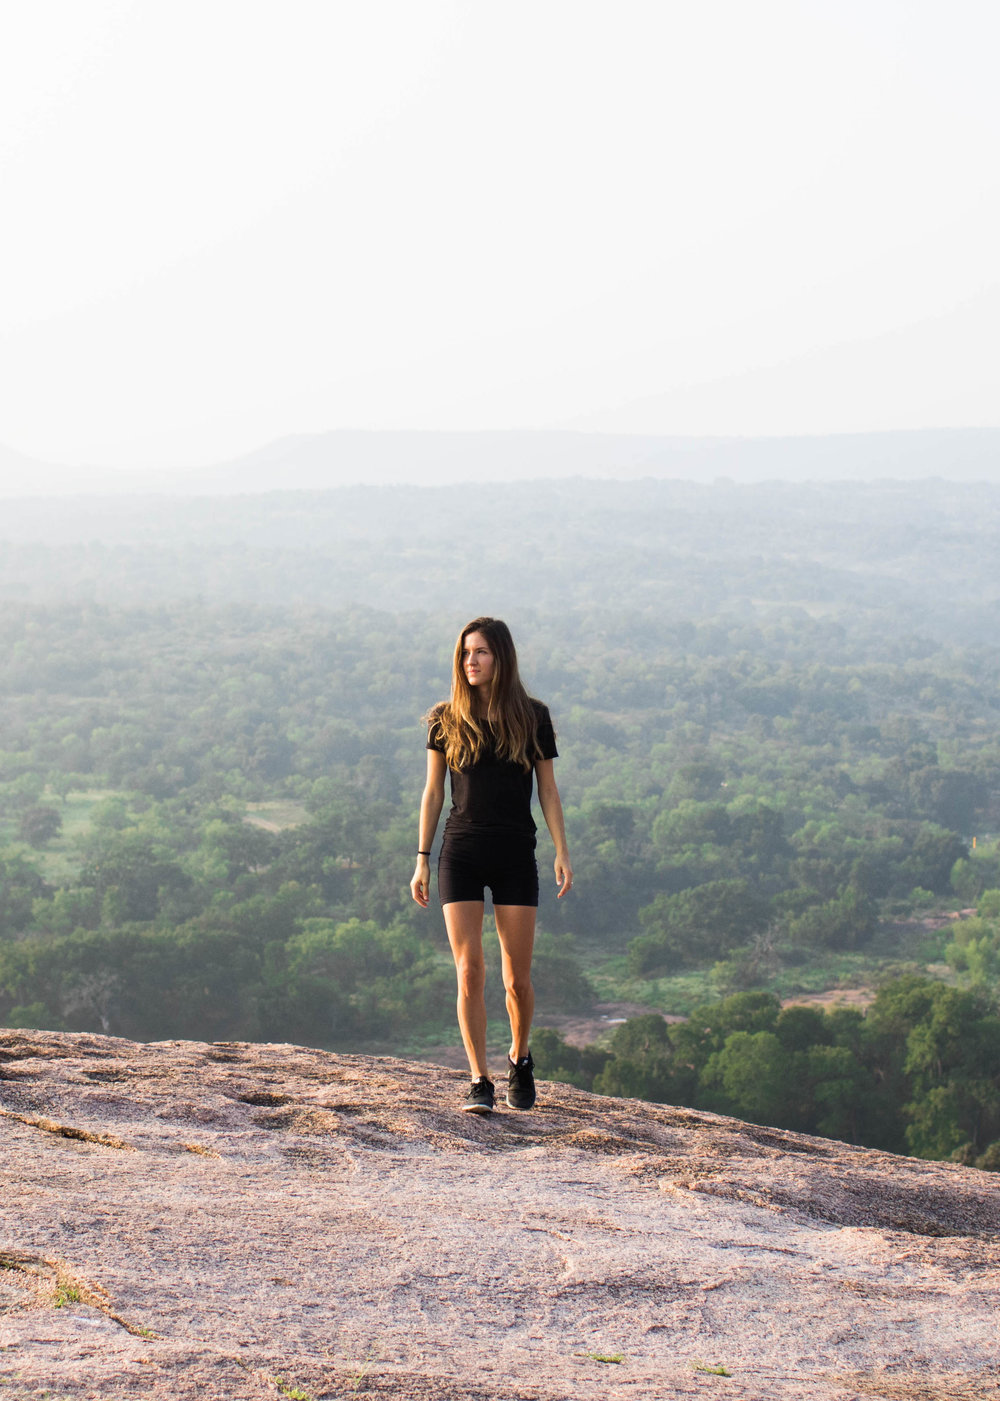 texas-enchanted-rock-photos-by-samantha-look.jpg